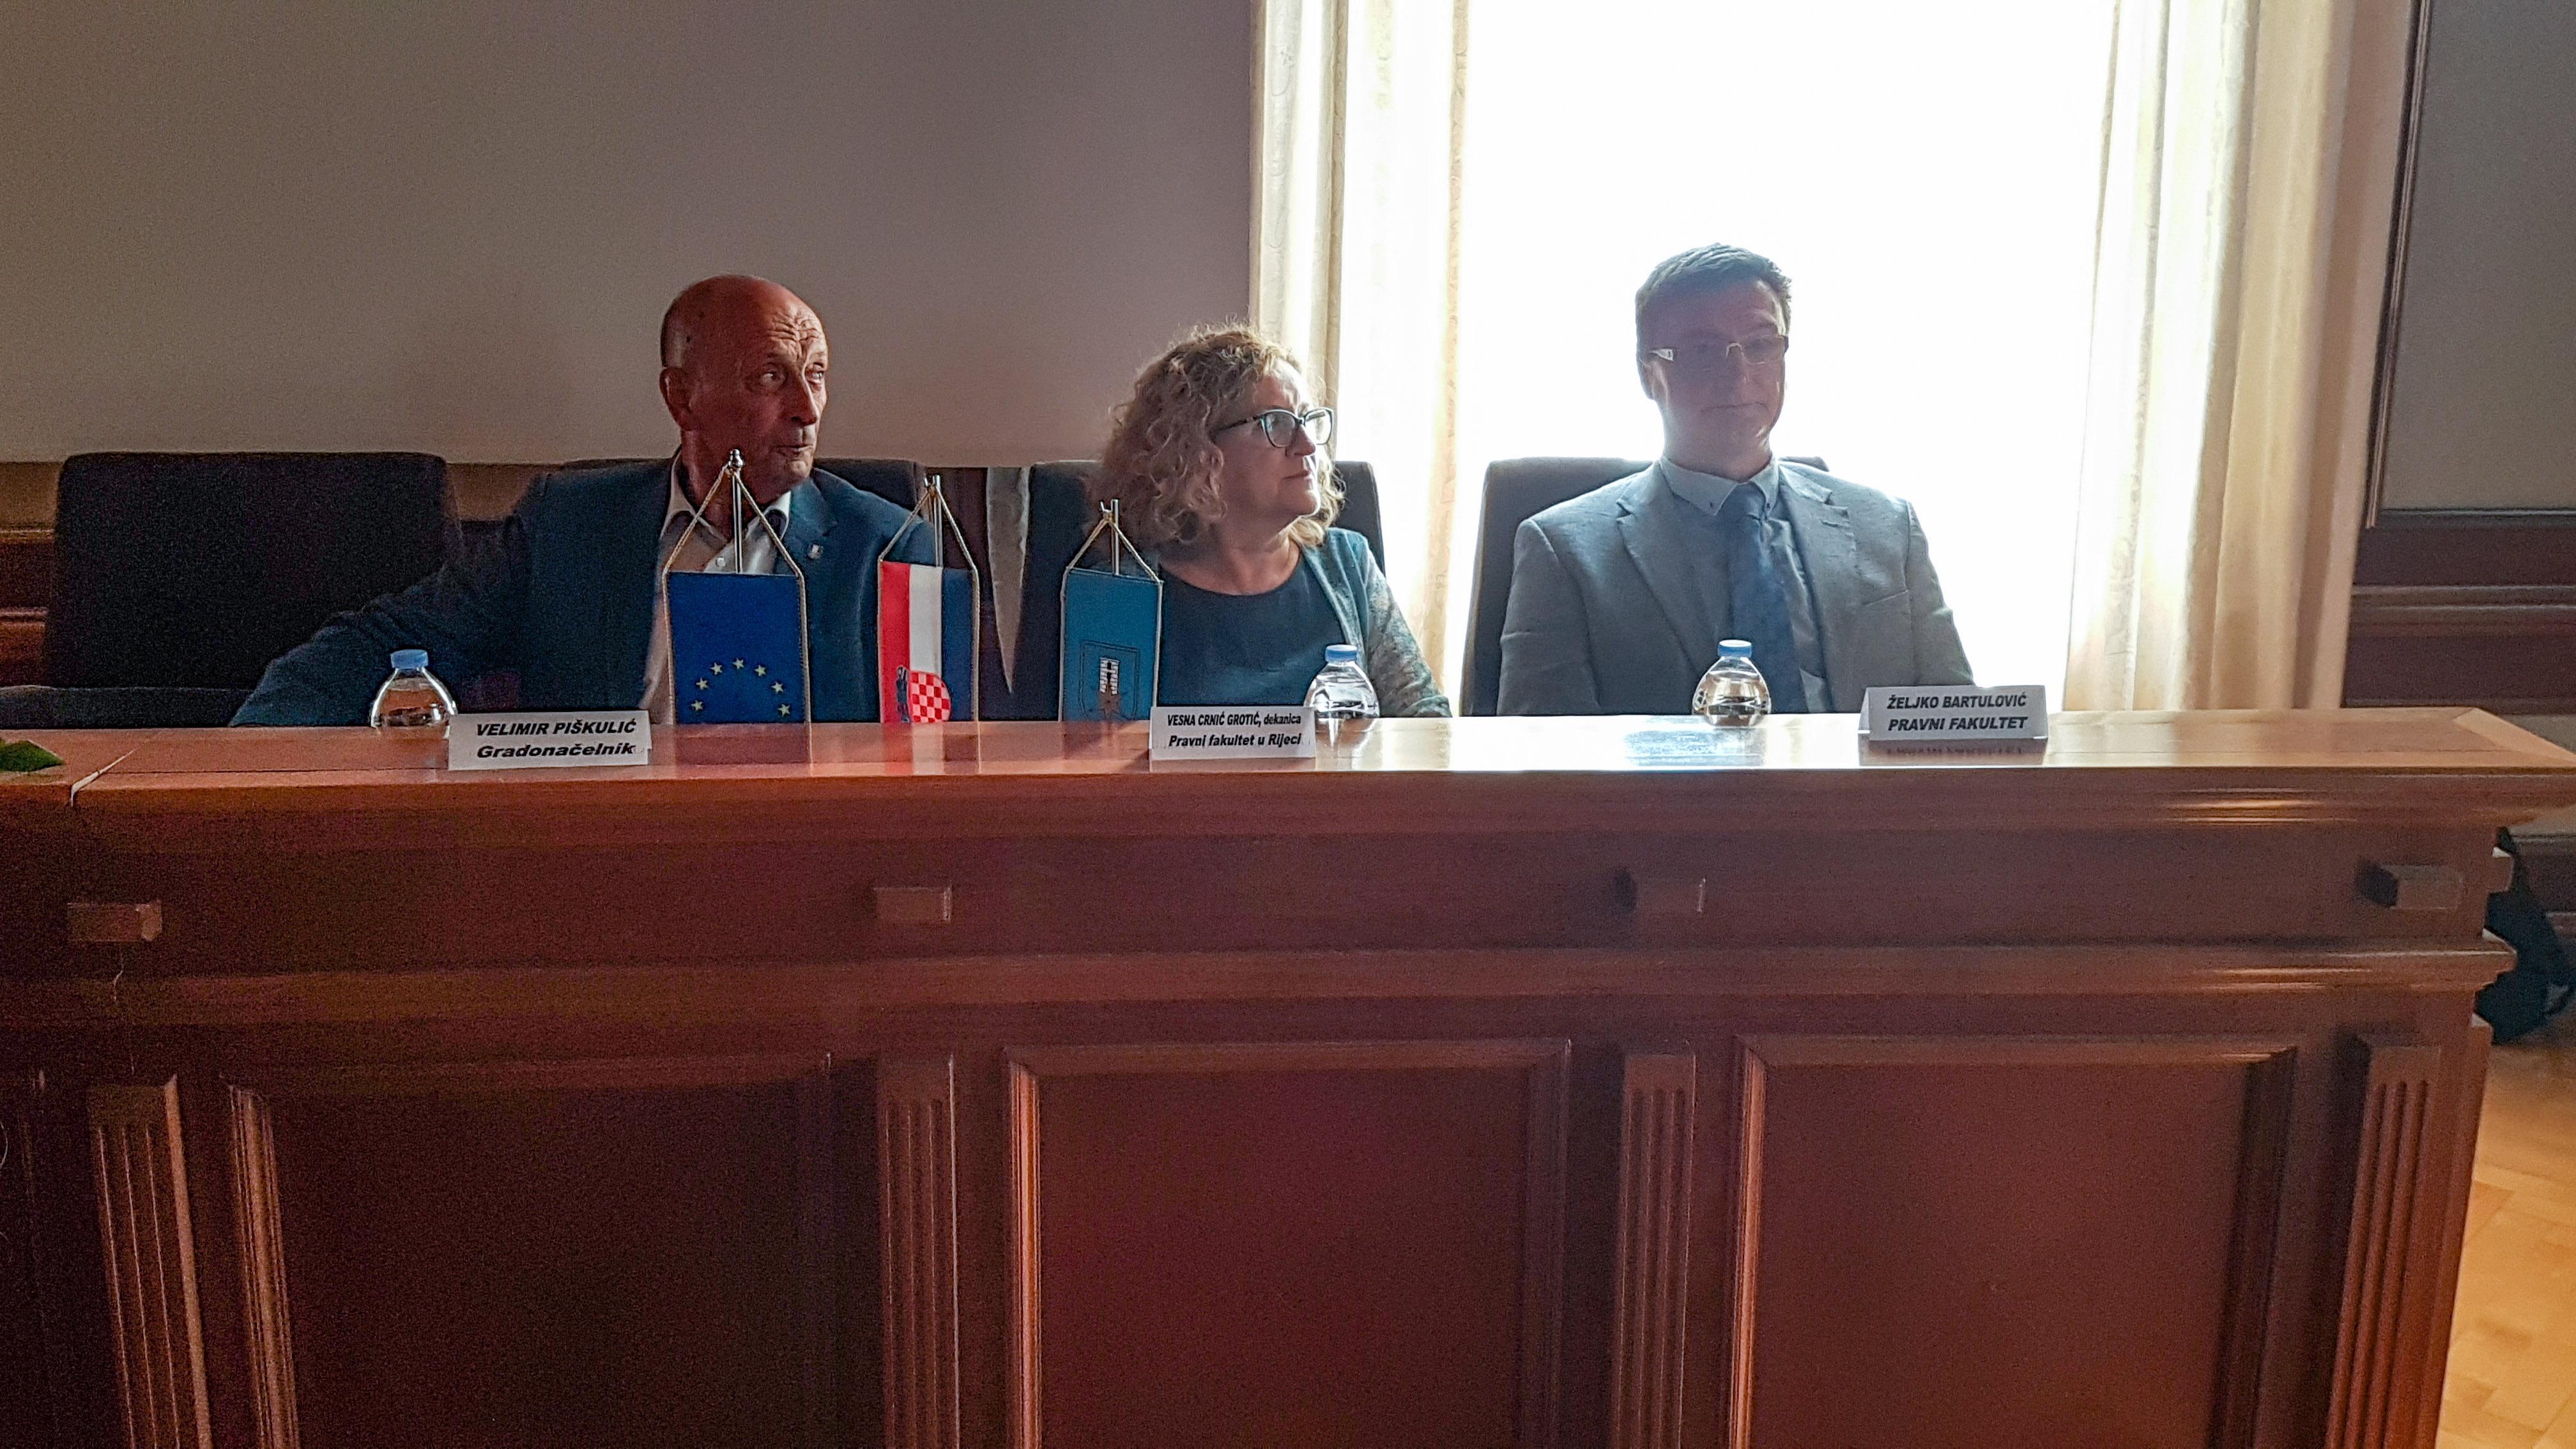 Ljetna škola ljudskih prava: Velimir Piškulić, Vesna Crnić Grotić i Željko Bartulović / Snimila Nataša CAR